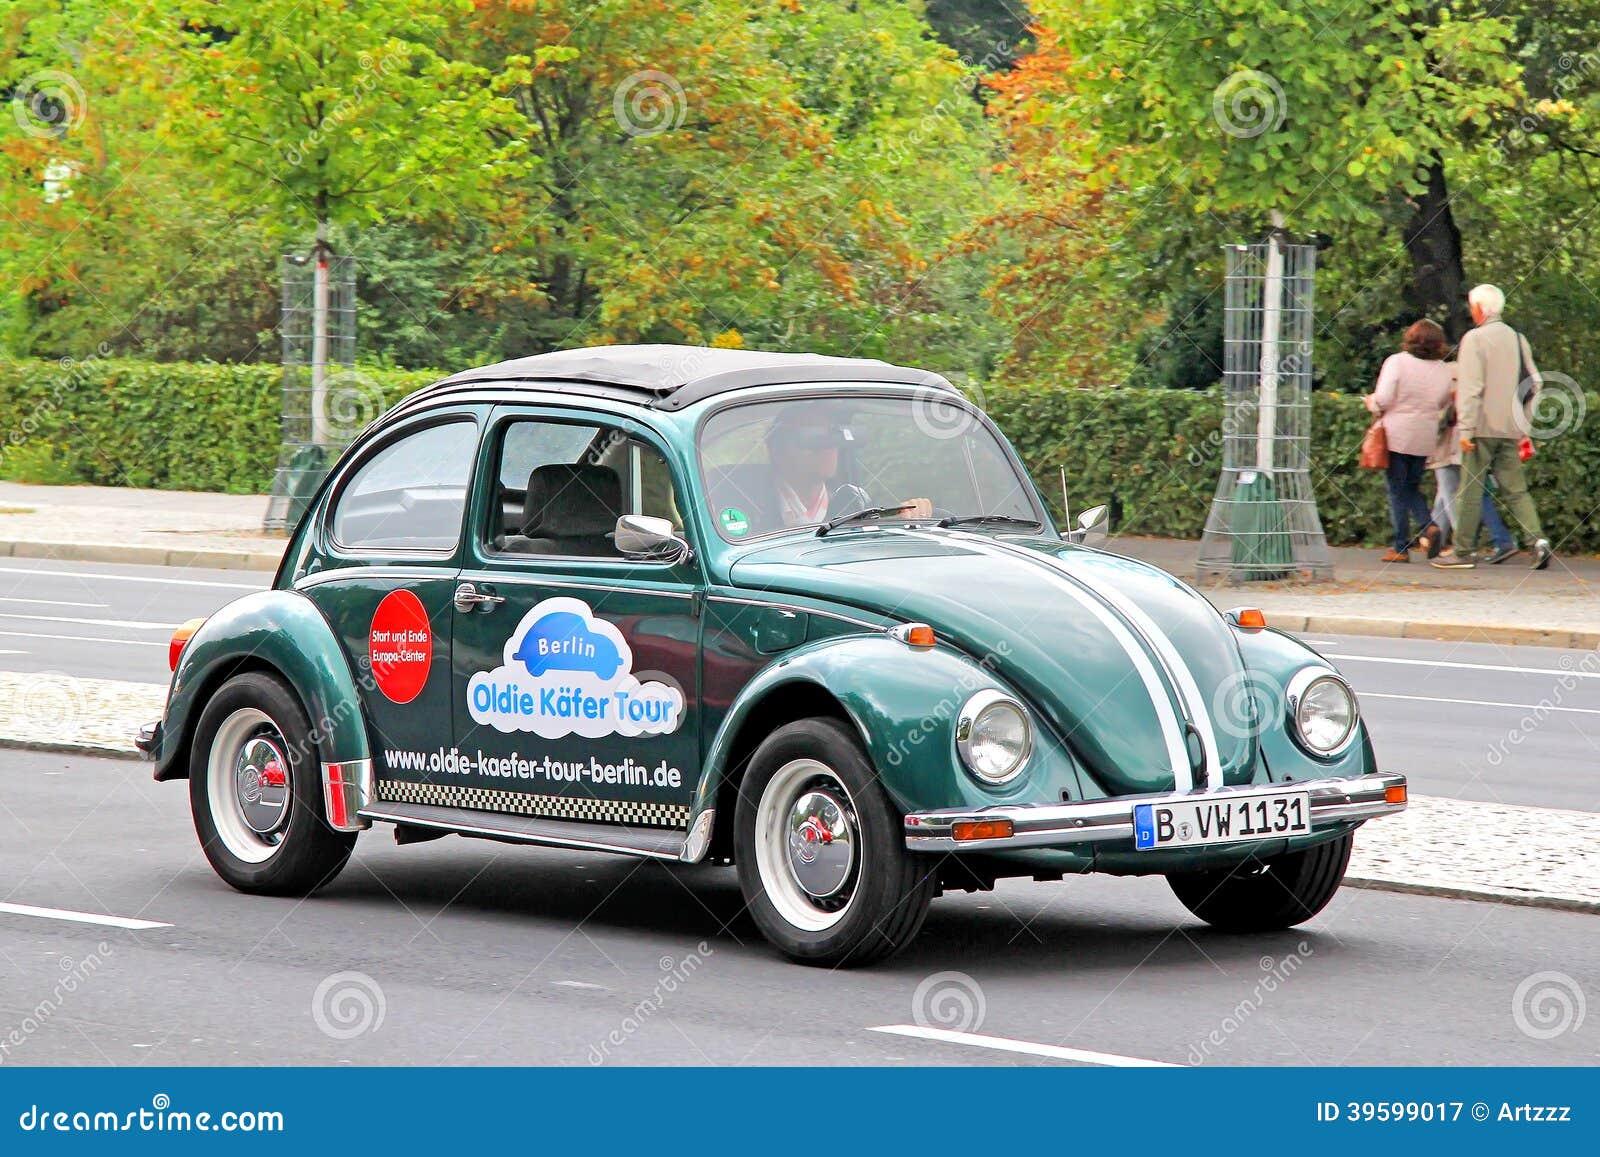 volkswagen beetle editorial photography image 39599017. Black Bedroom Furniture Sets. Home Design Ideas